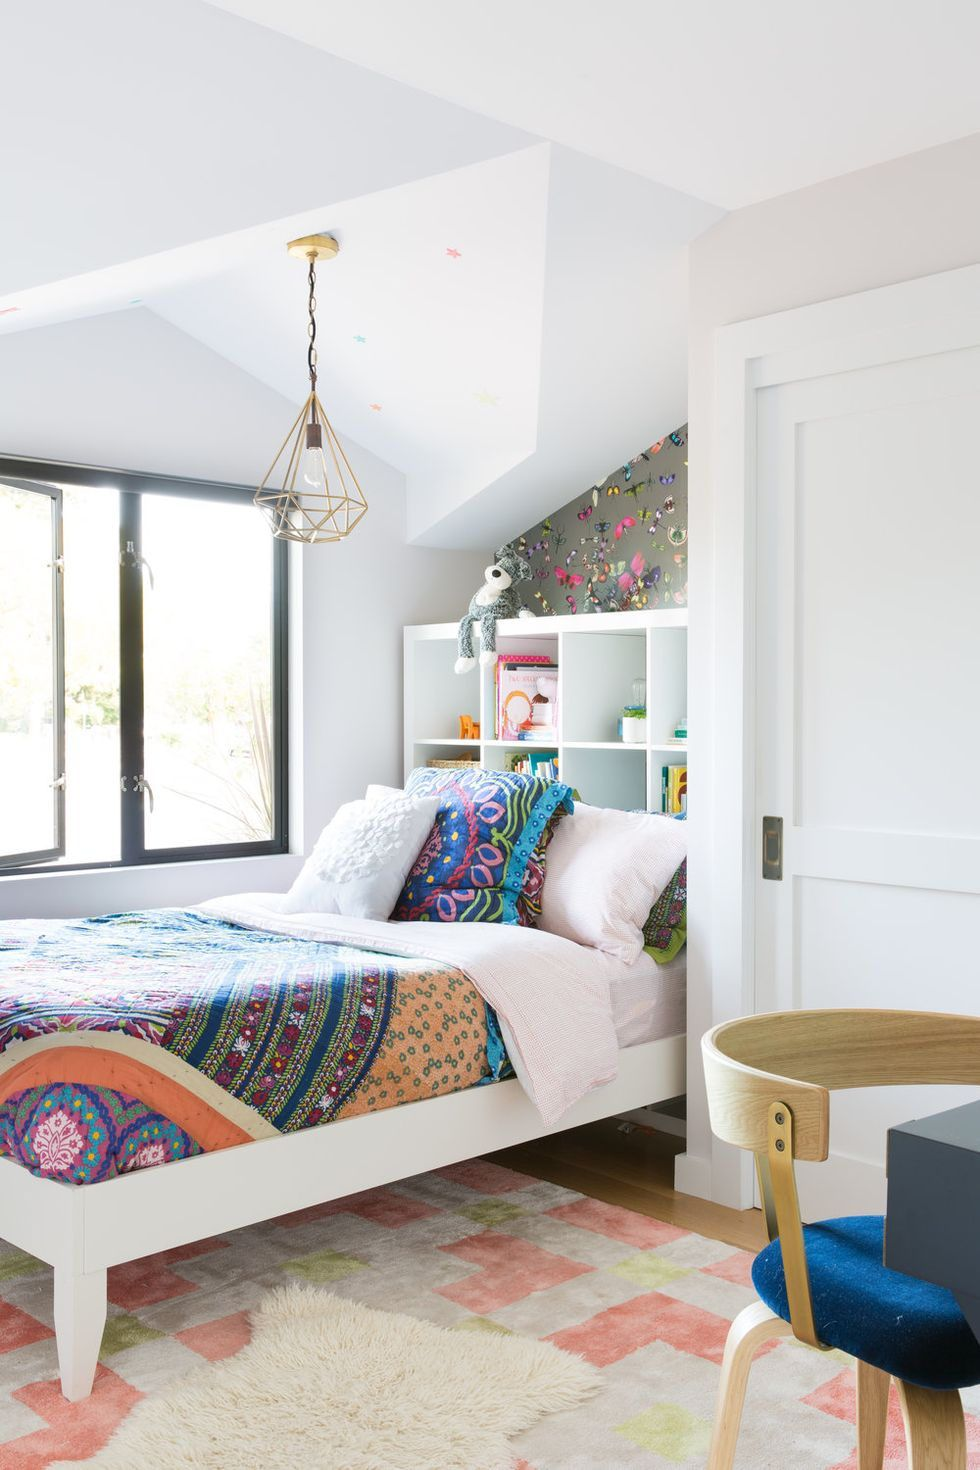 13 Creative Ways To Use Peel And Stick Wallpaper Kids Room Design Bedroom Decor Room